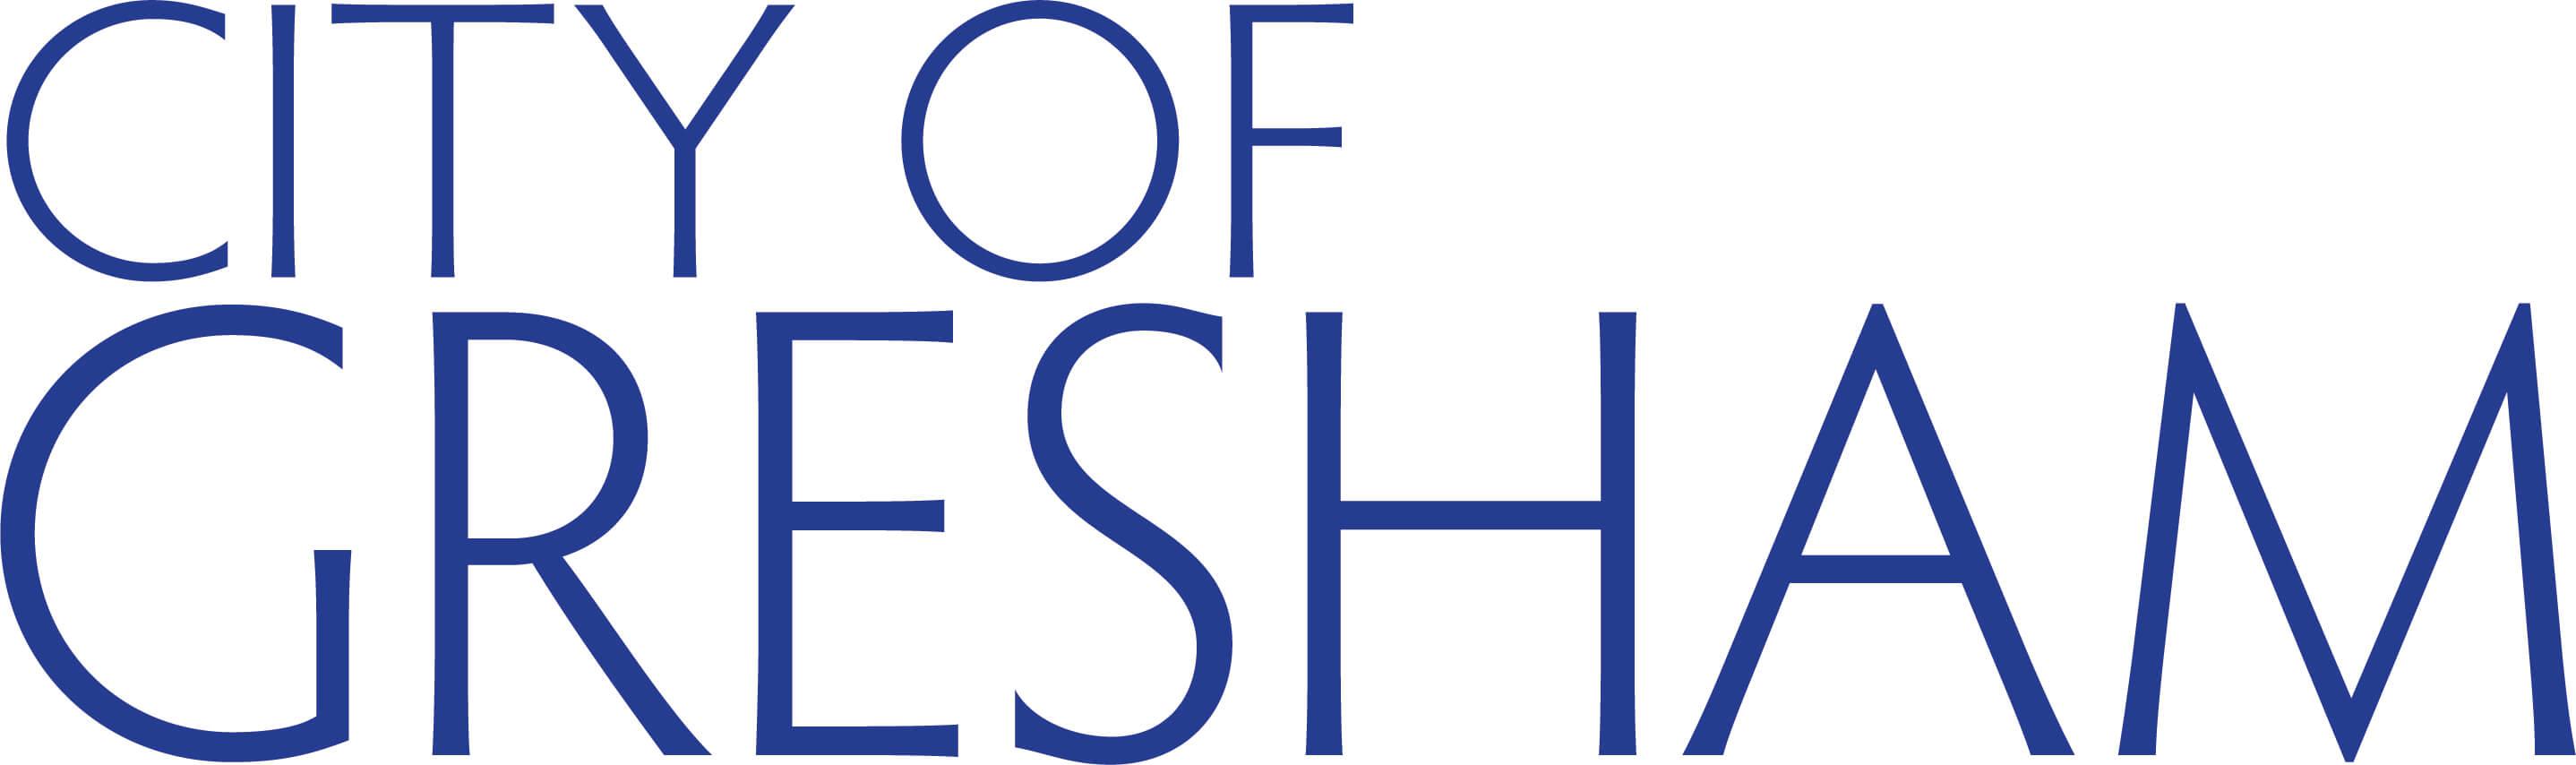 City of Gresham Official Logo